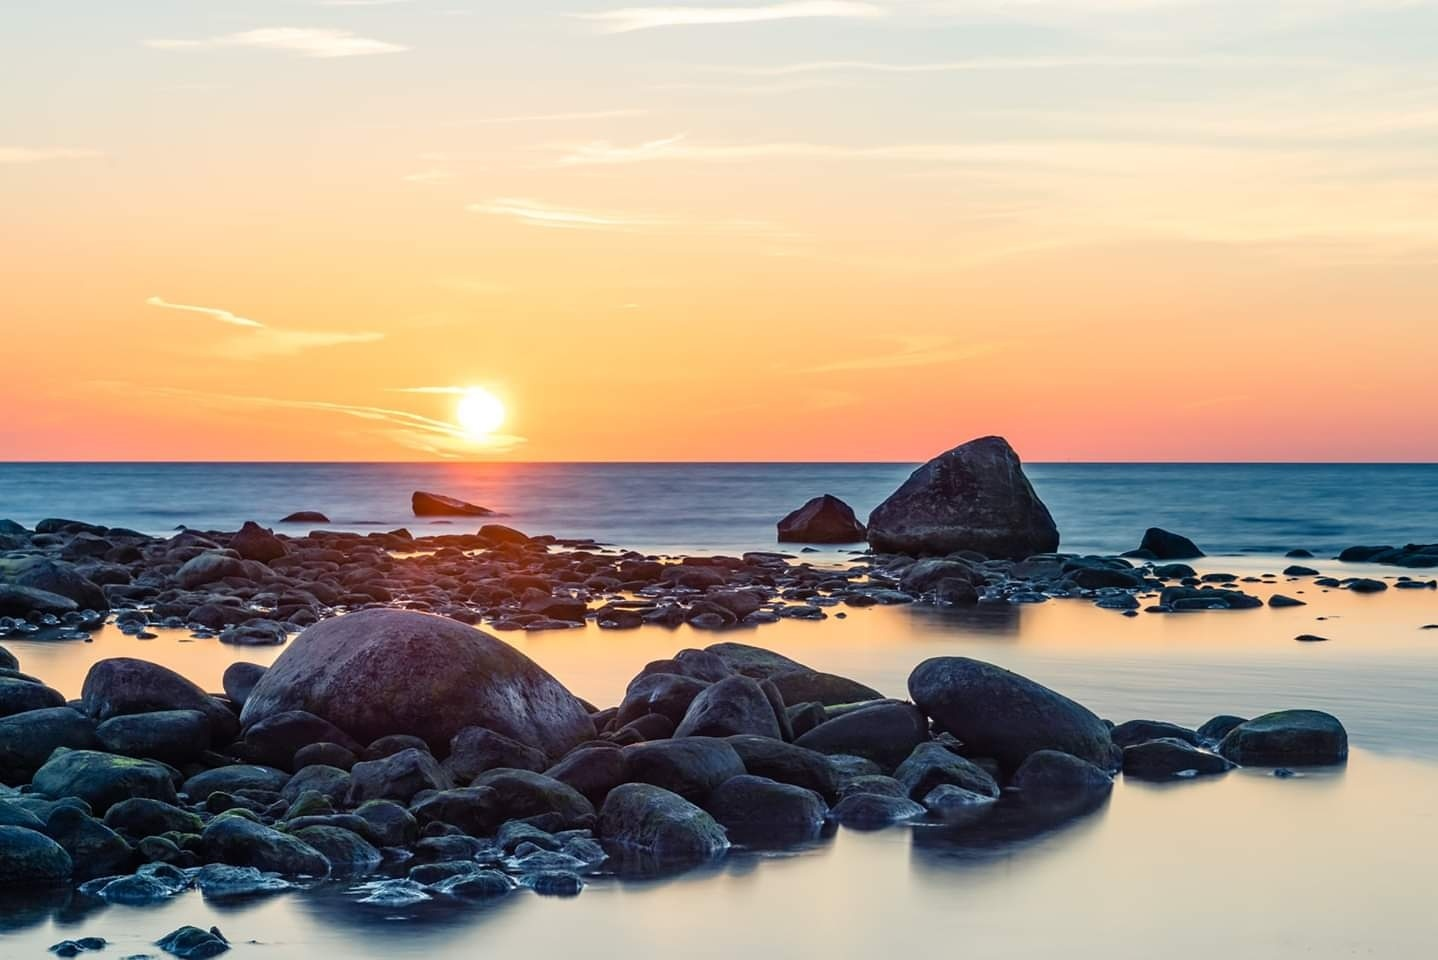 Sunset by Nicklas Hjelm